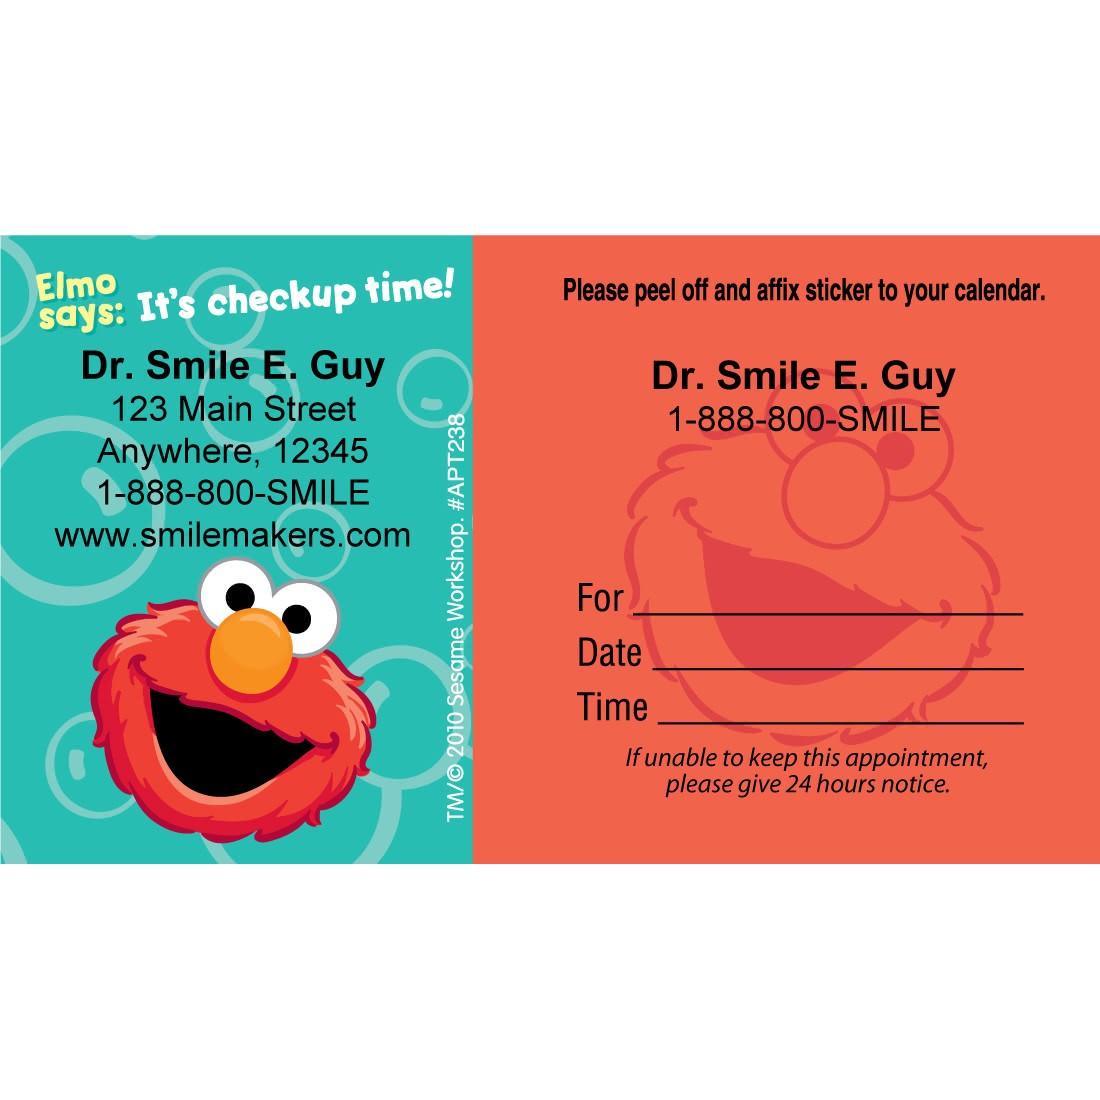 Custom Elmo Sticker Appointment Cards [image]